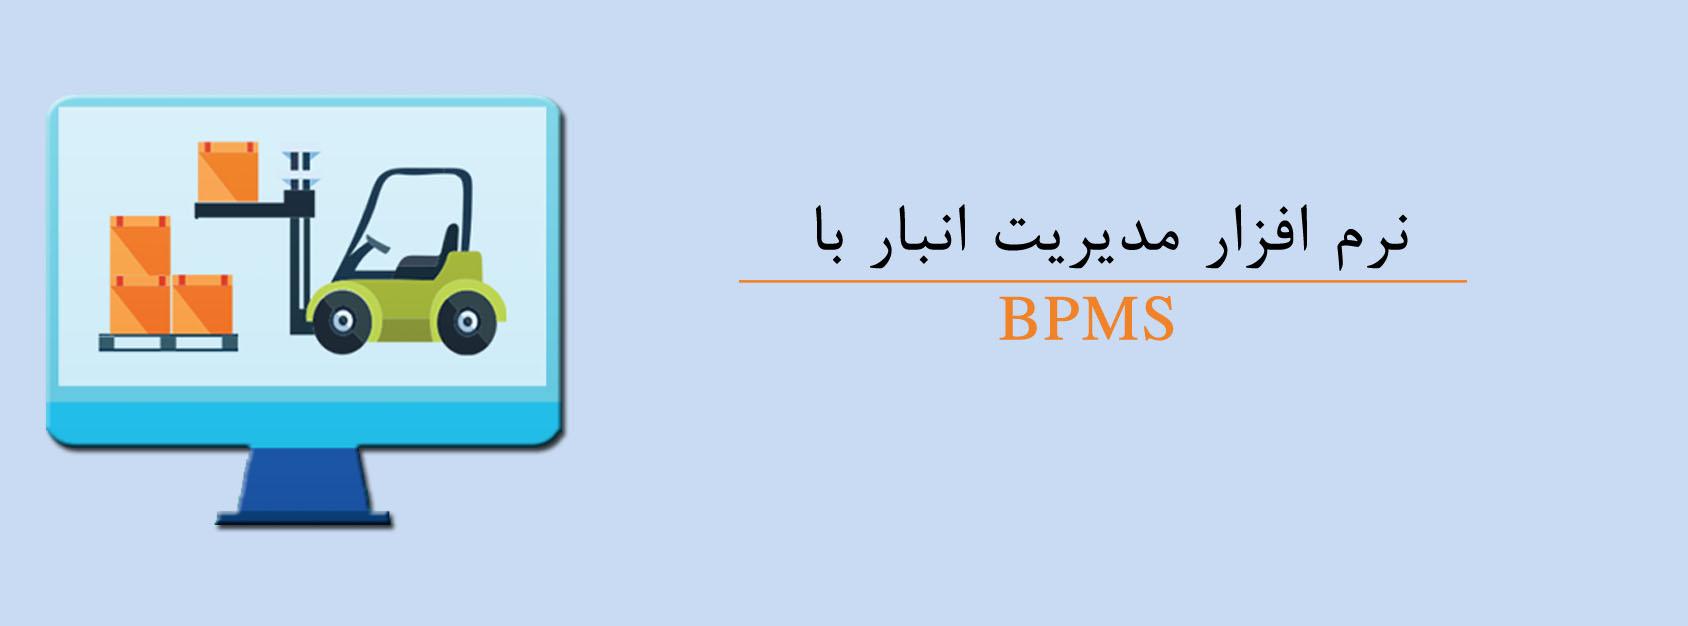 Inventory BPMS